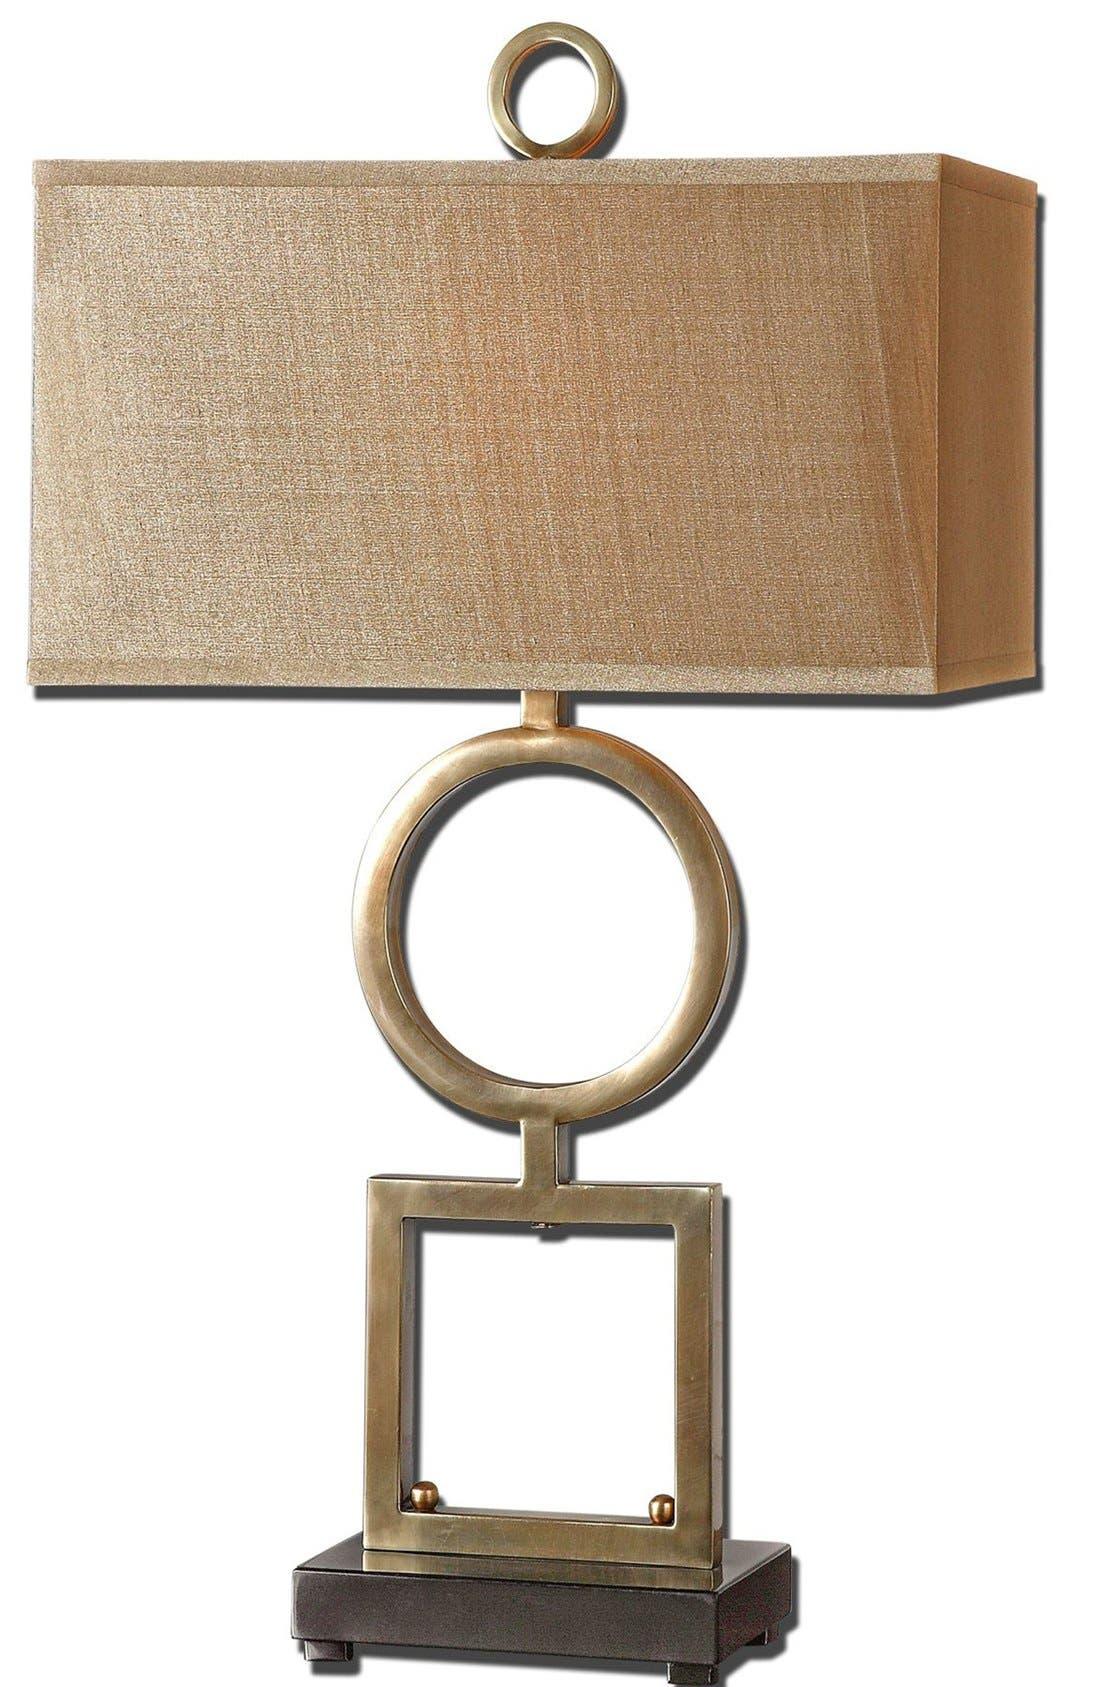 Main Image - Uttermost 'Rashawn' Table Lamp